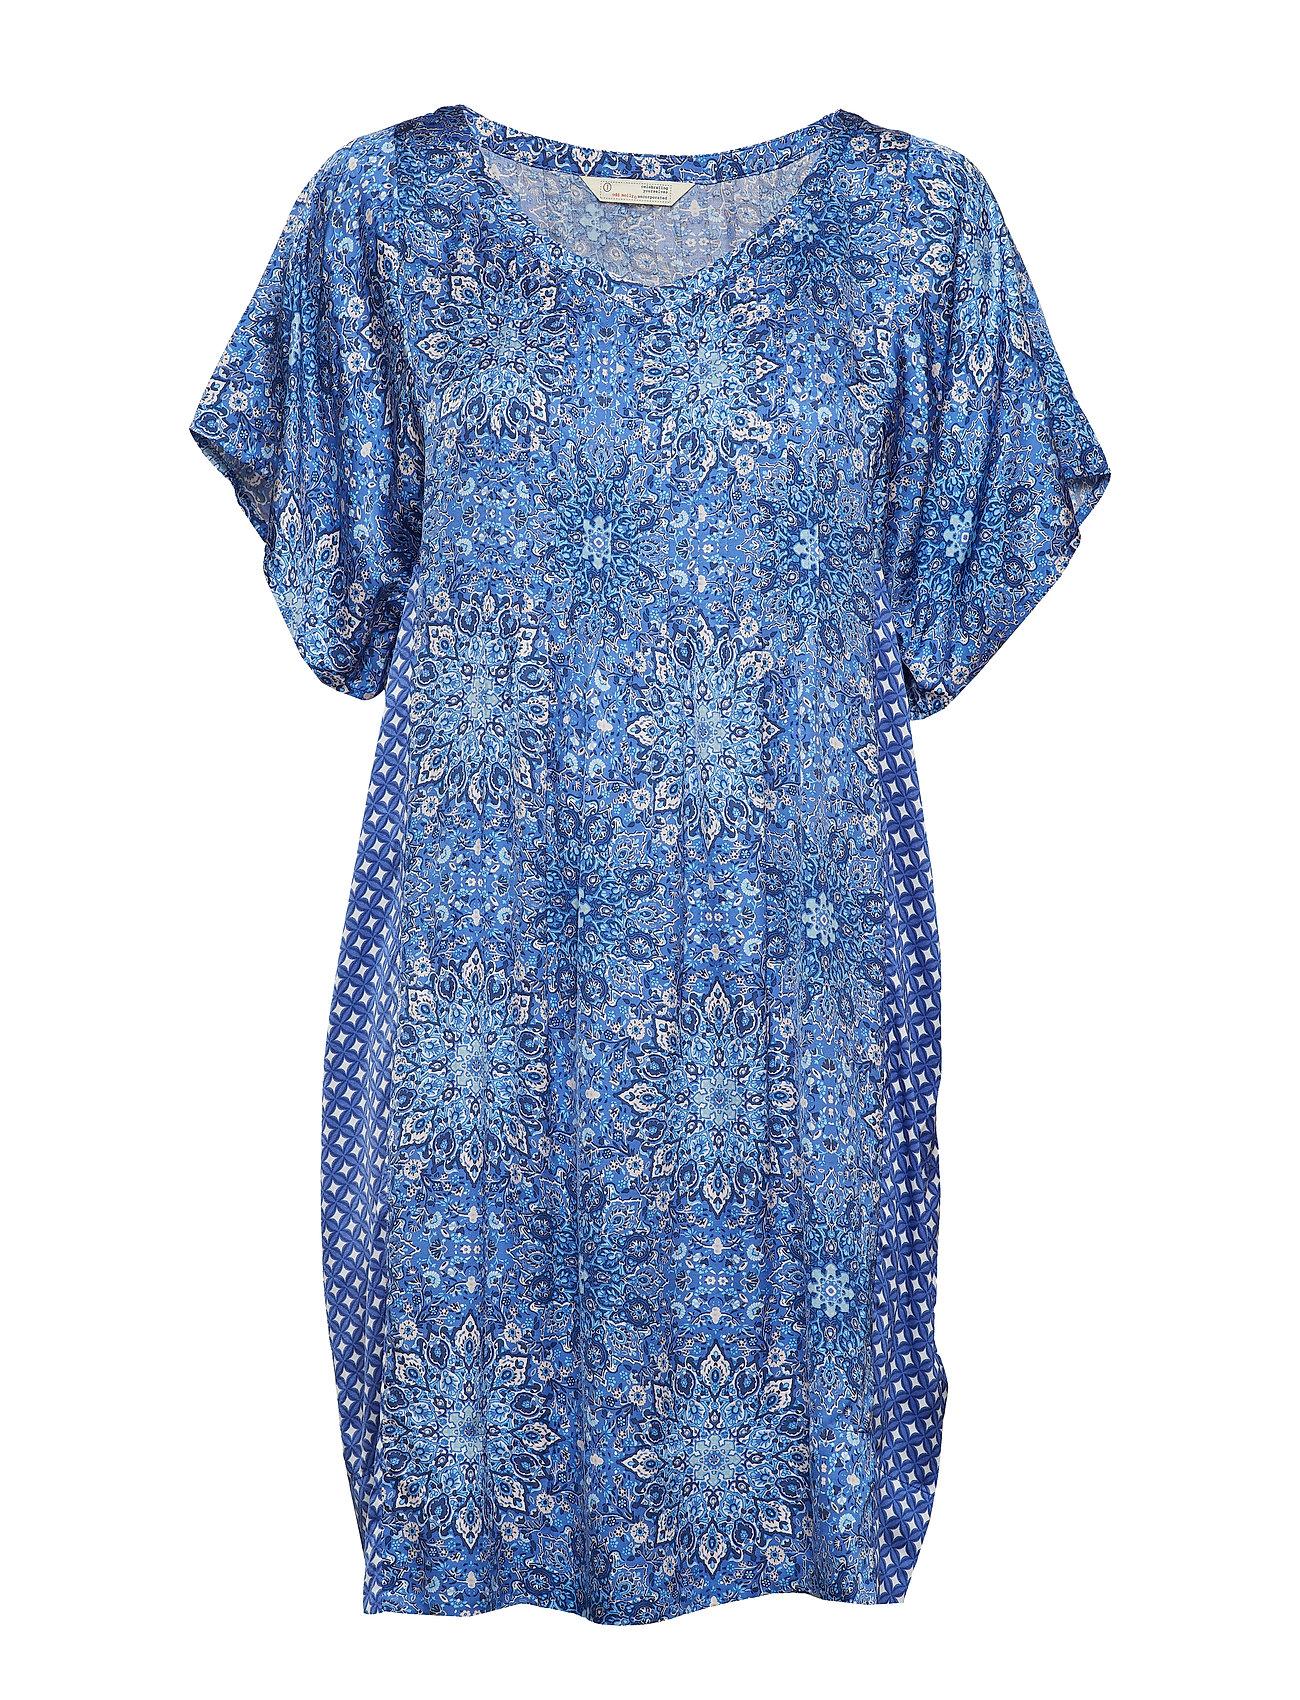 ODD MOLLY empowher dress - SEA BLUE